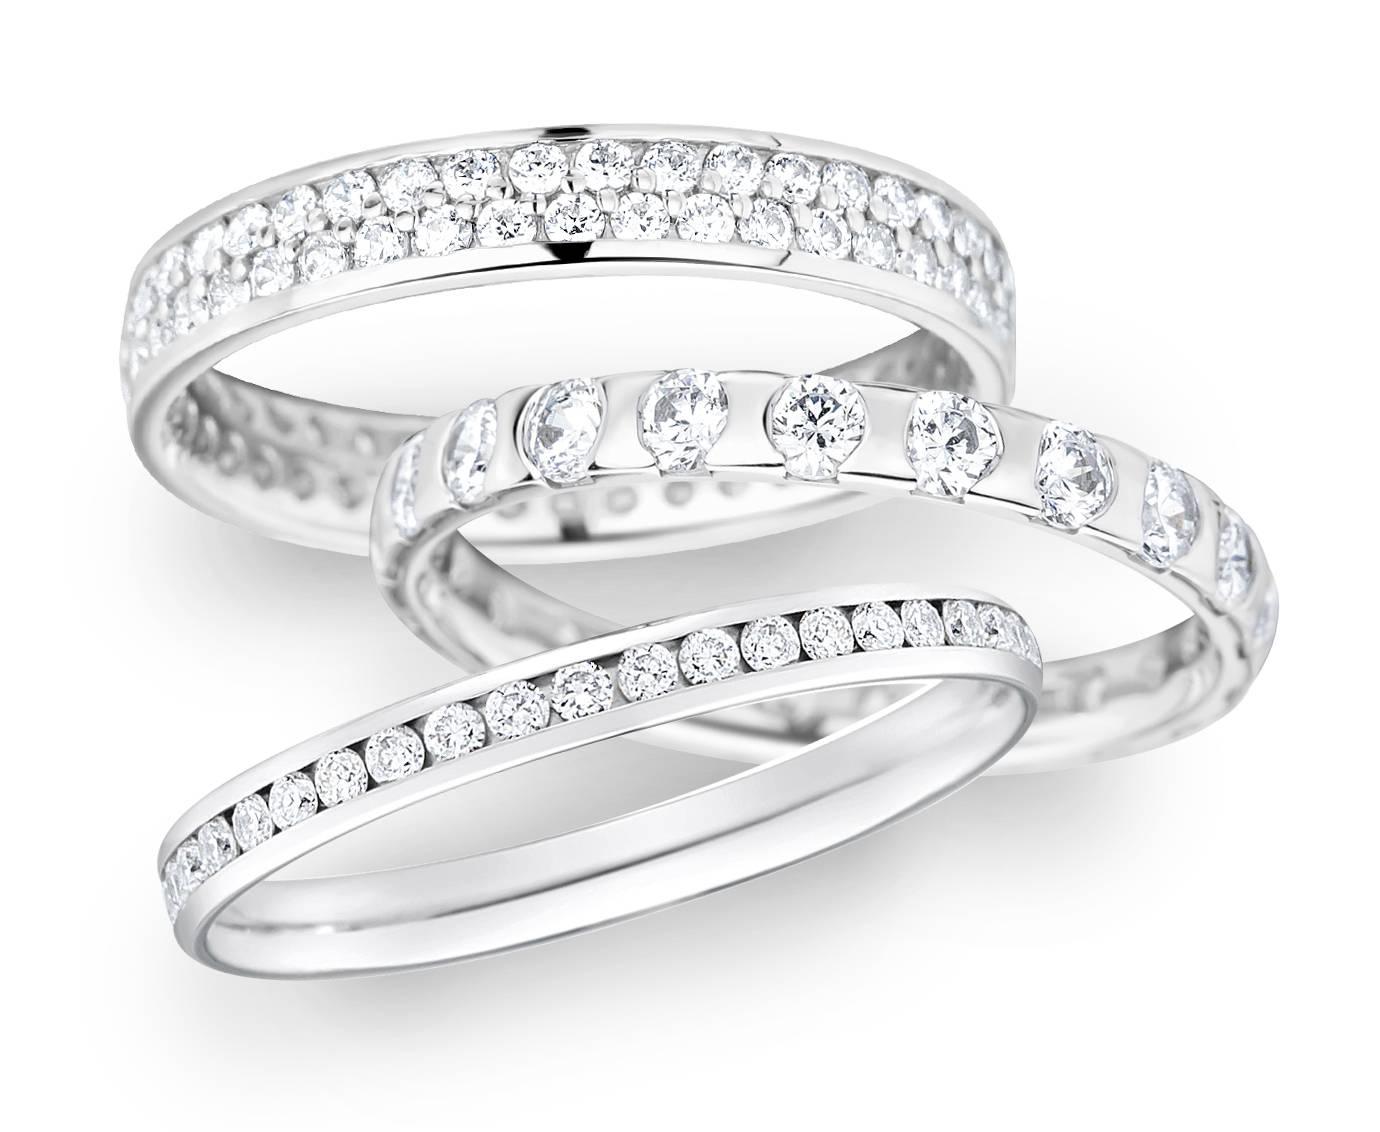 Wedding Rings : Diamond And Wedding Ring Bargain Centre Diamond Pertaining To Diamond Wedding Rings (View 15 of 15)